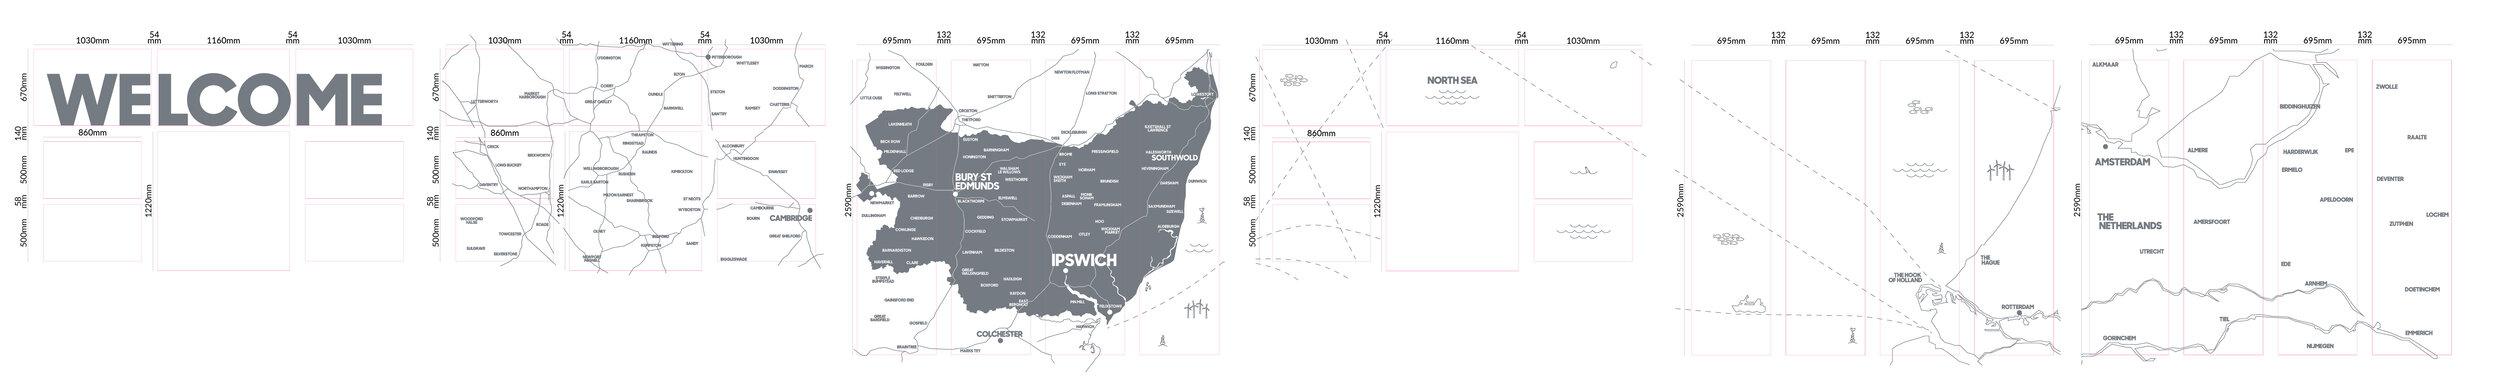 mappingWindows_US.jpg